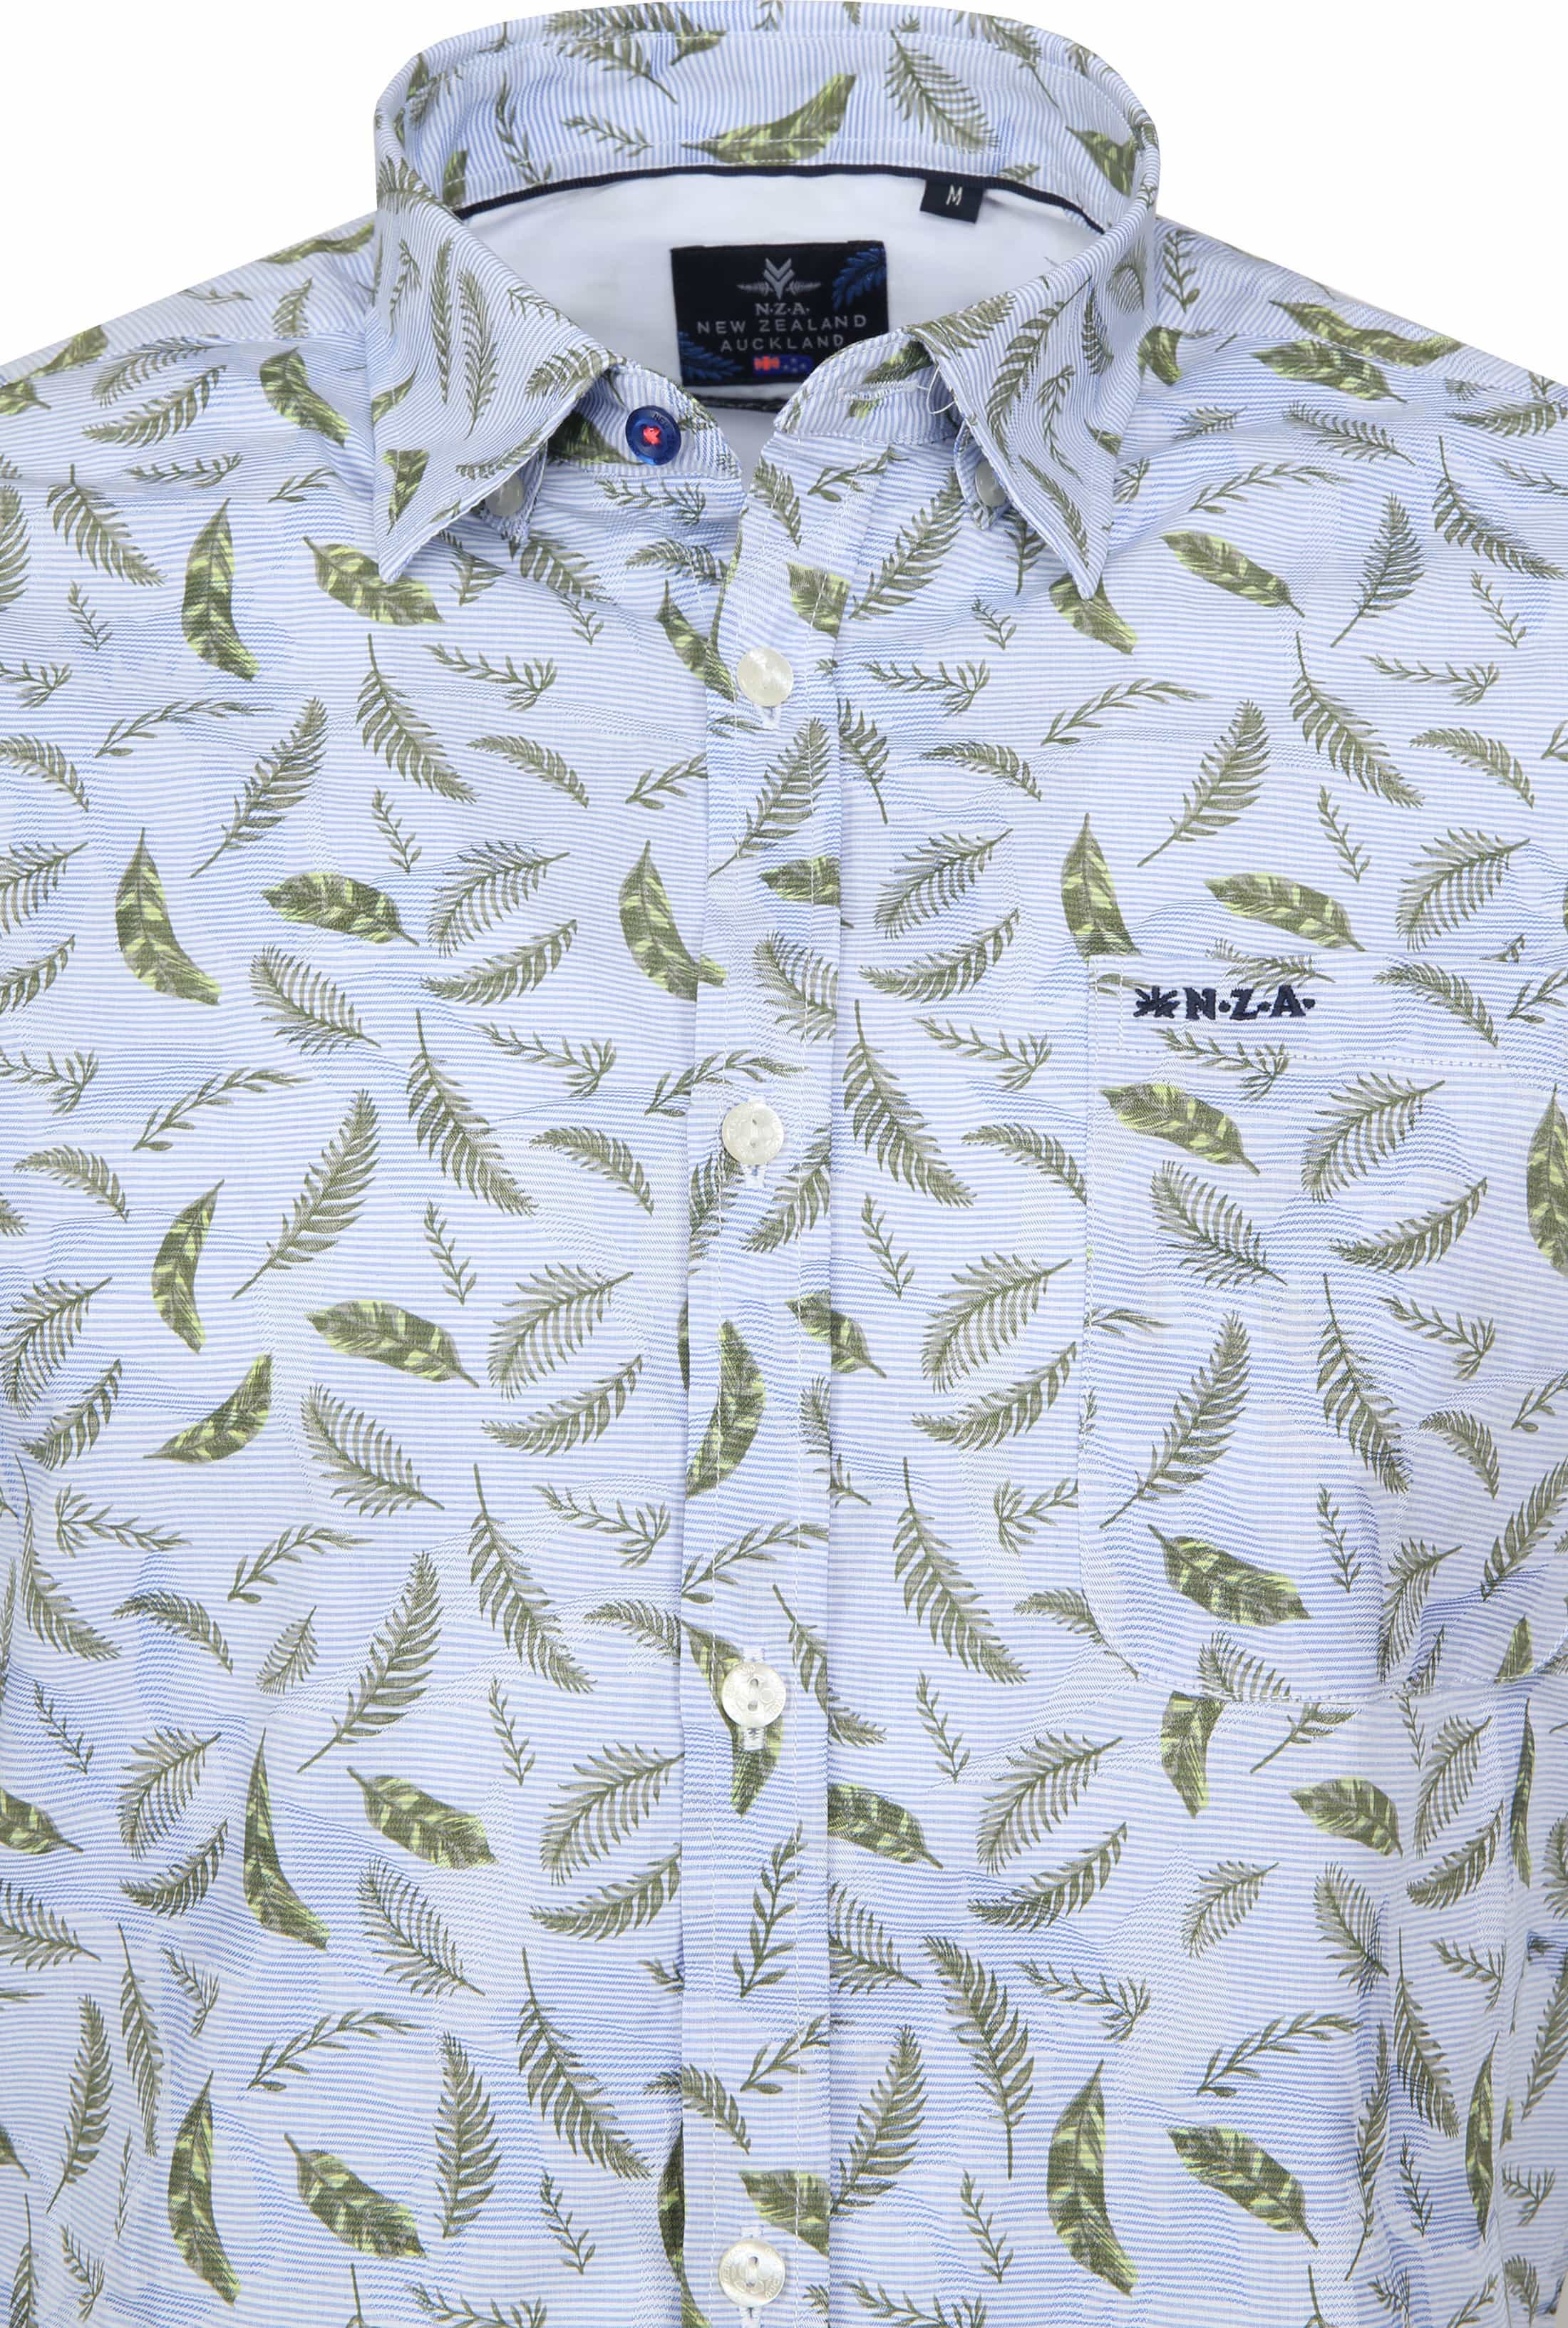 NZA Shirt Hauroko foto 2